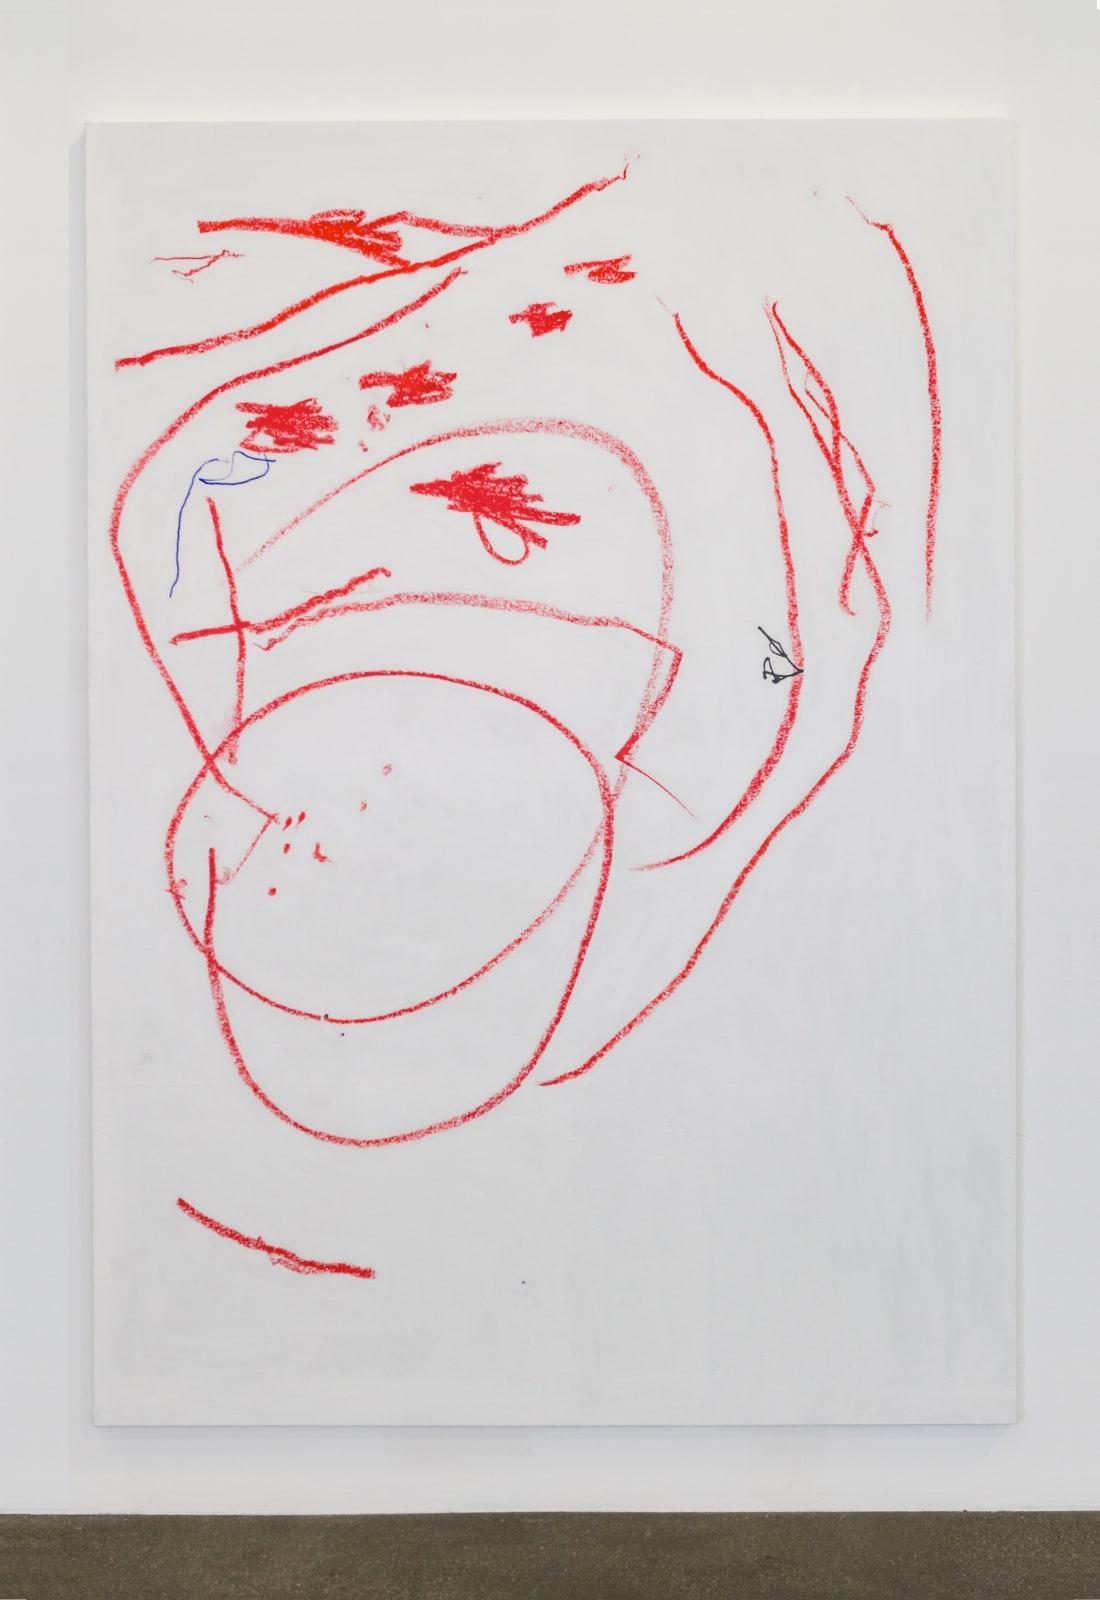 Nadia Kaabi-Linke, Pale Geranium Lake and Scarlet (remastered) , 2018